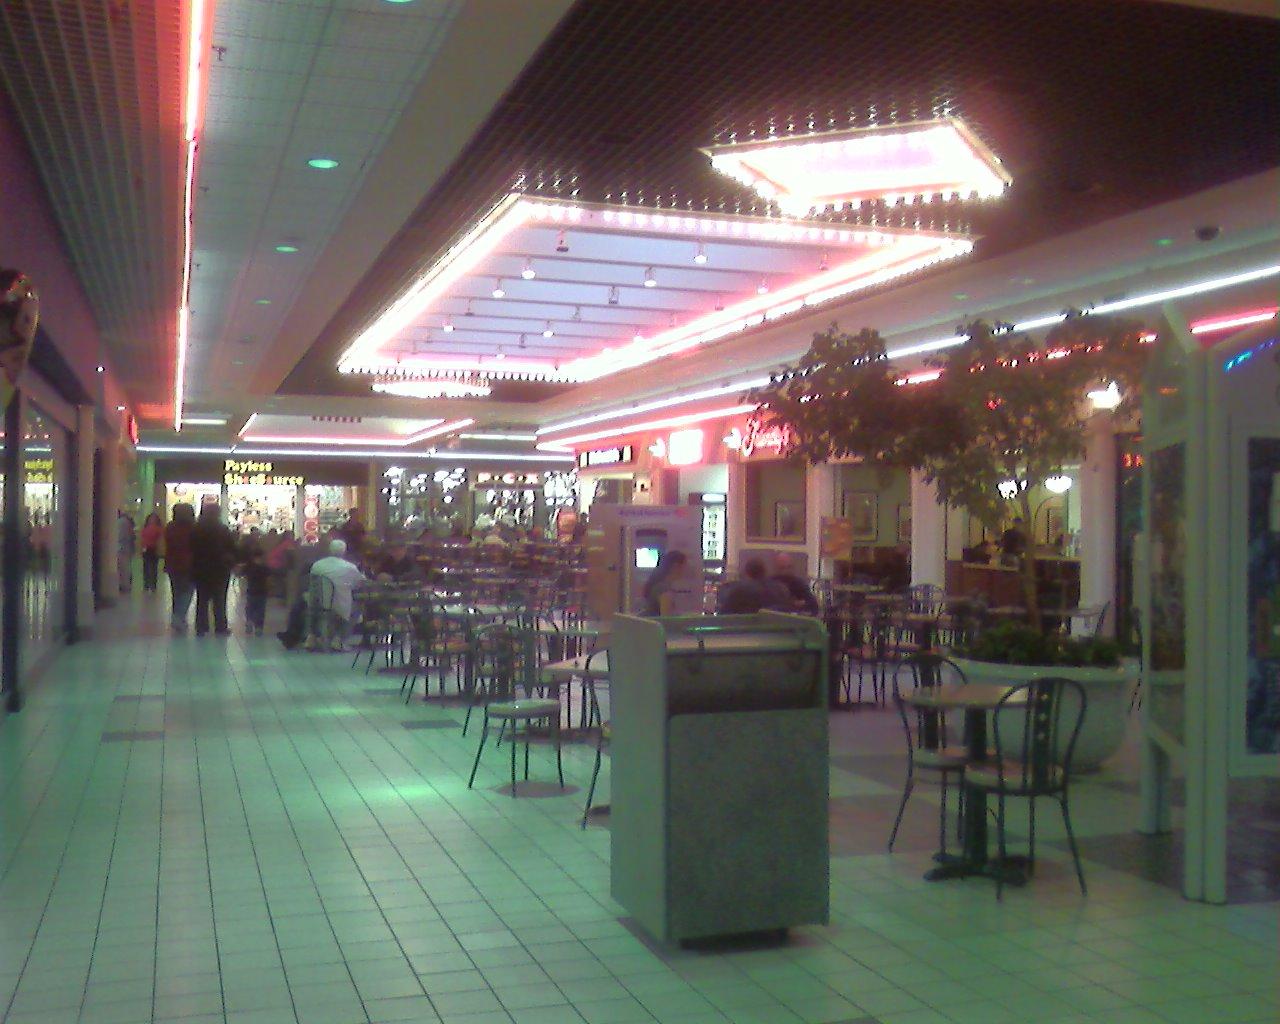 Albertville Outlet Mall Food Court